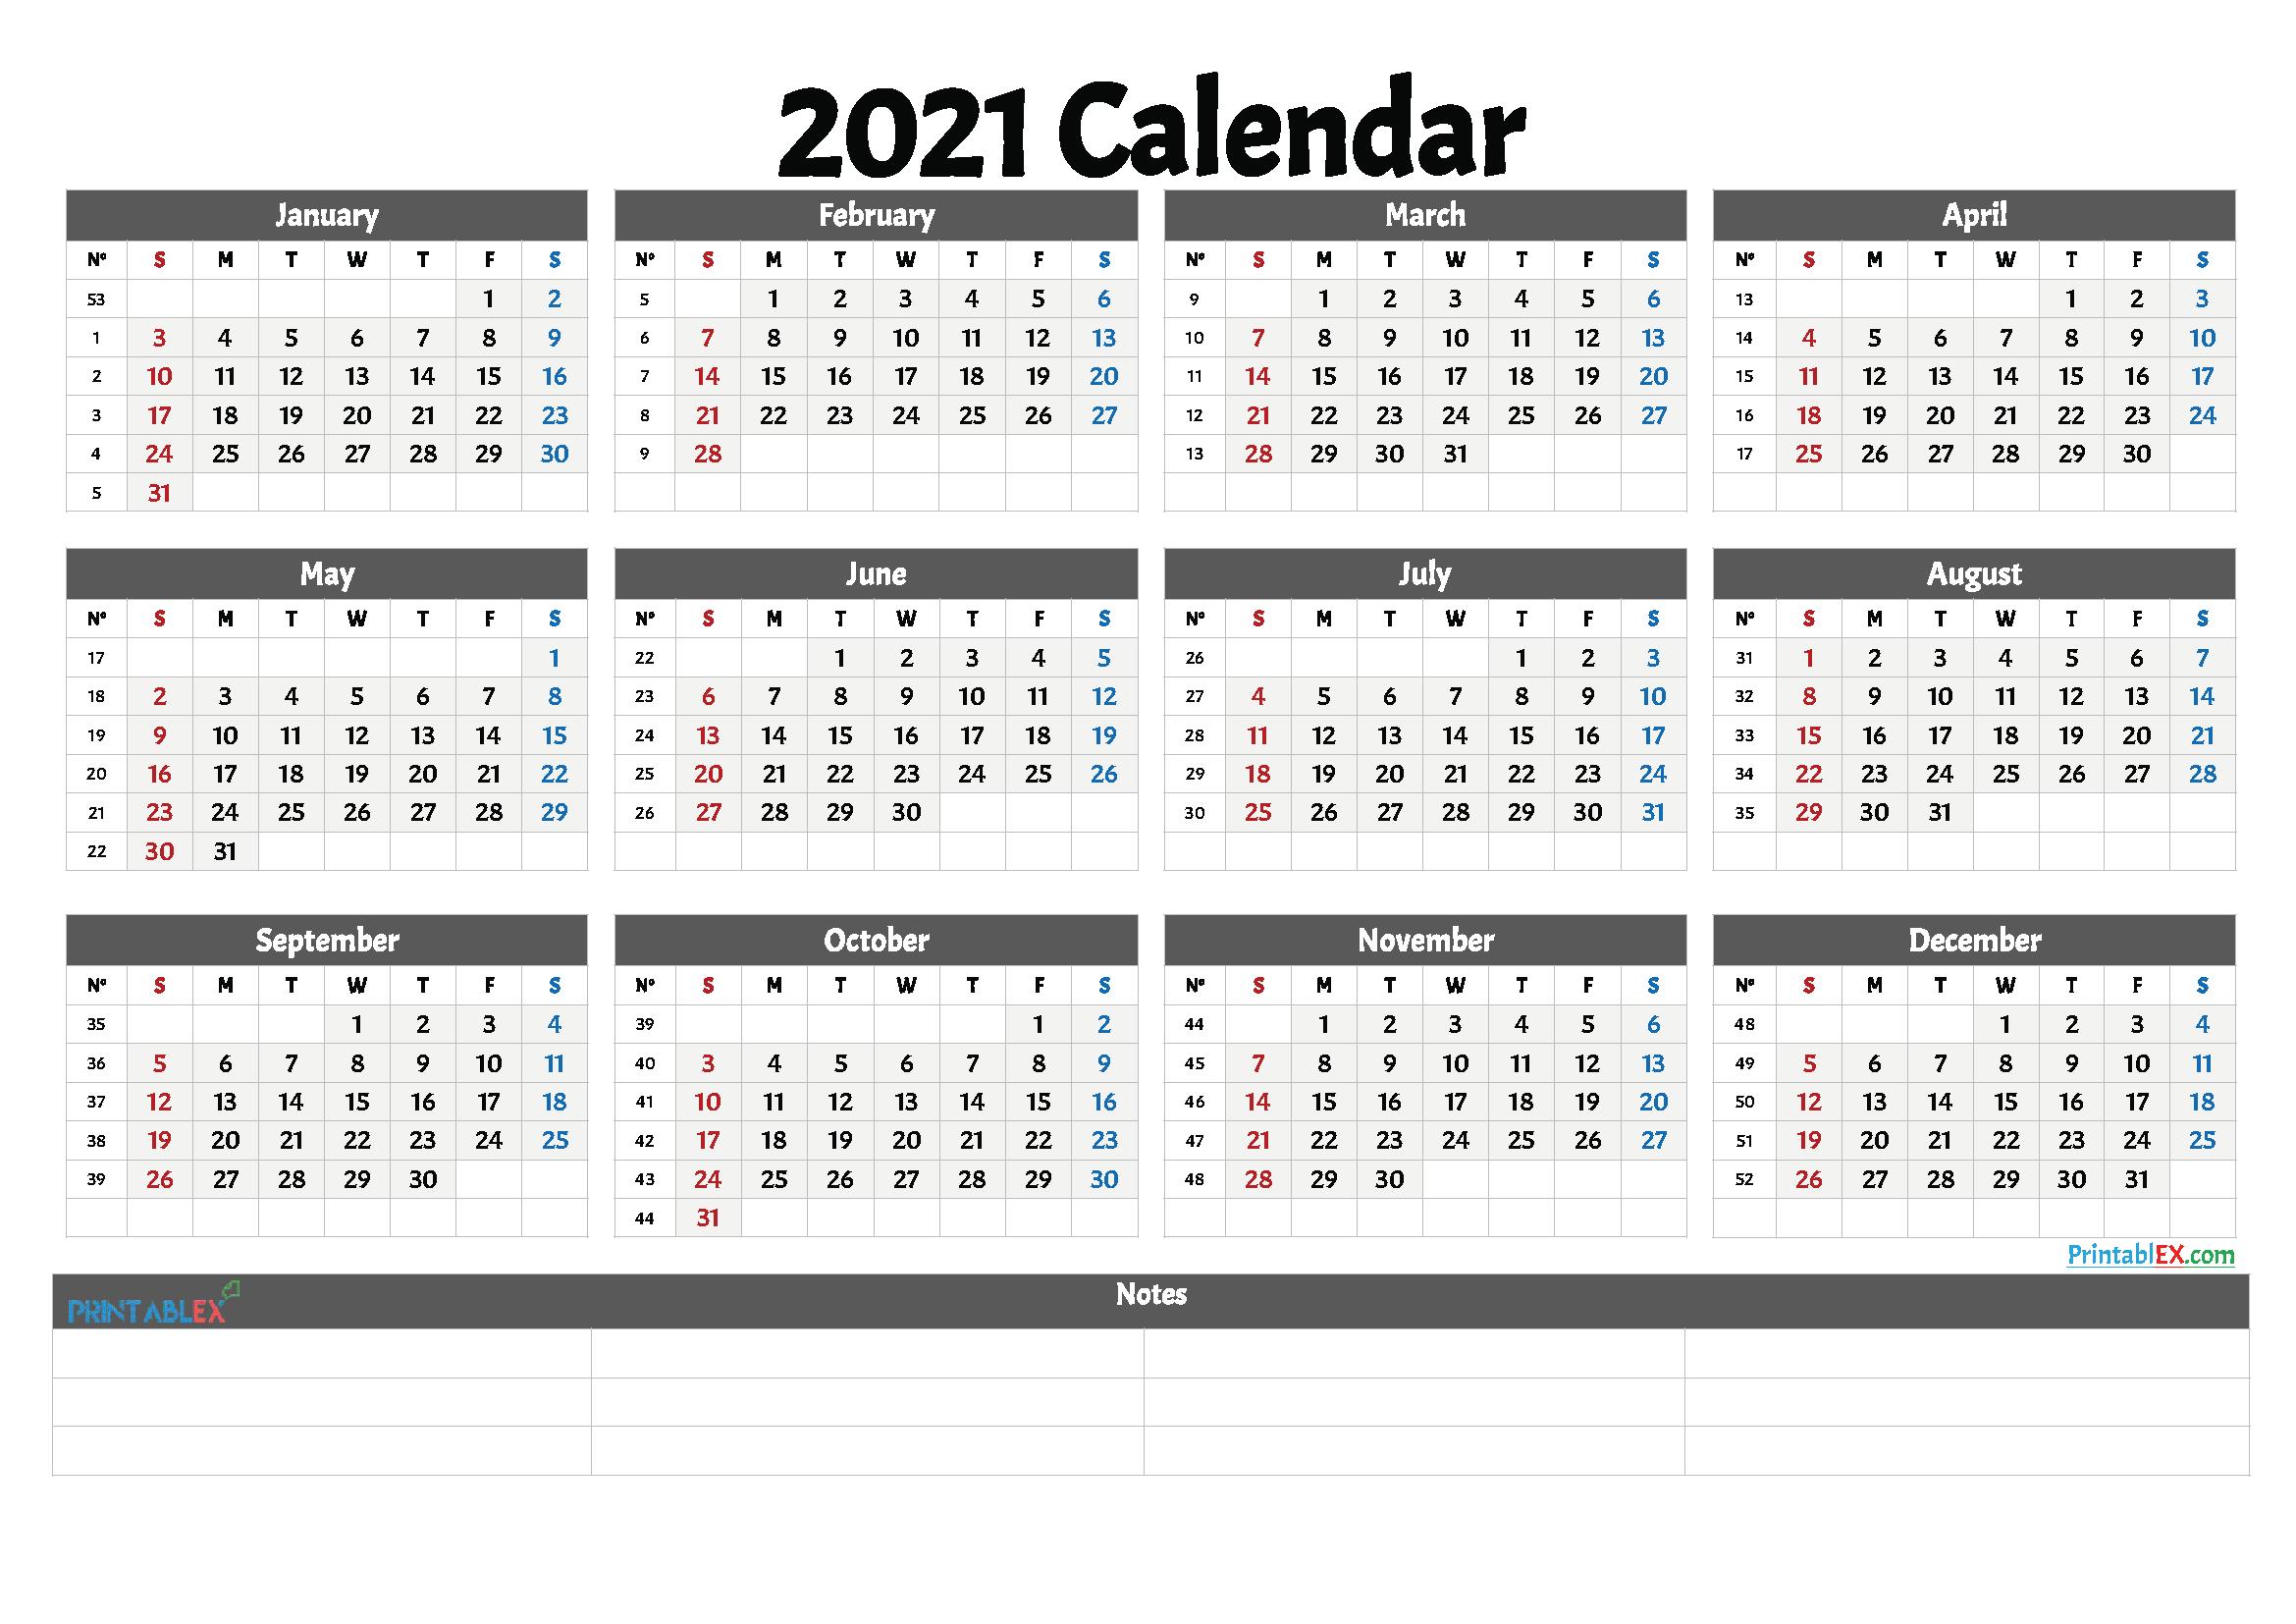 2021 Free Printable Yearly Calendar With Week Numbers – Free regarding 2021 Yearly Calendar With Boxes